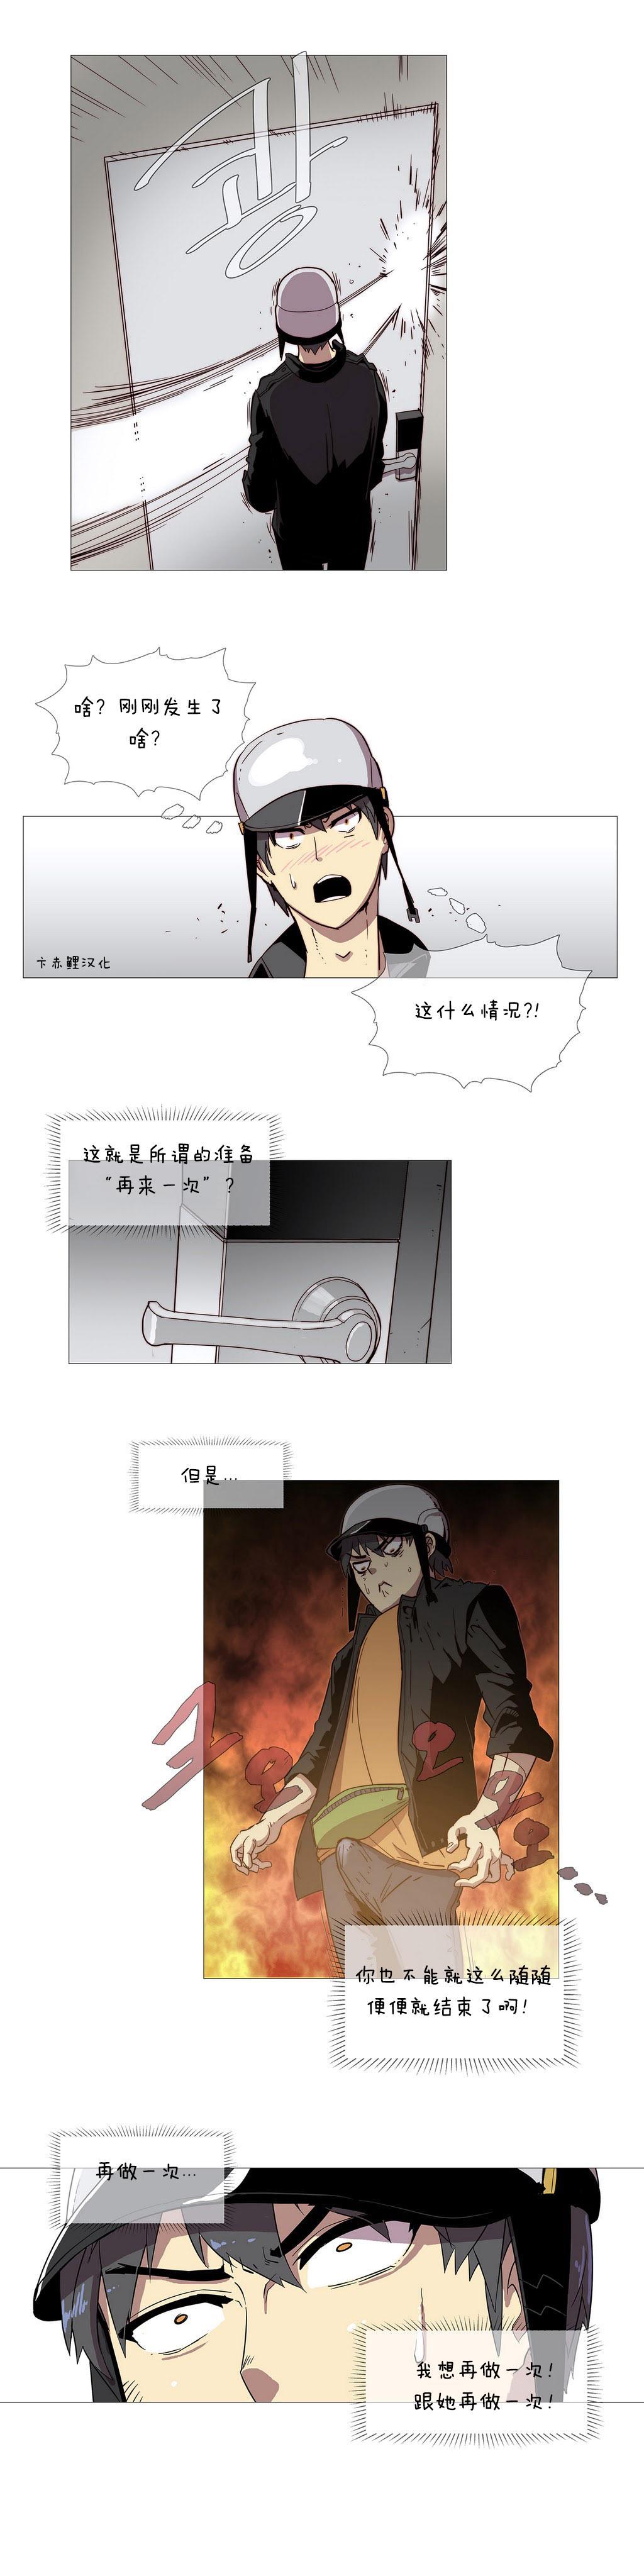 HouseHold Affairs 【卞赤鲤个人汉化】1~21话(持续更新中) 28